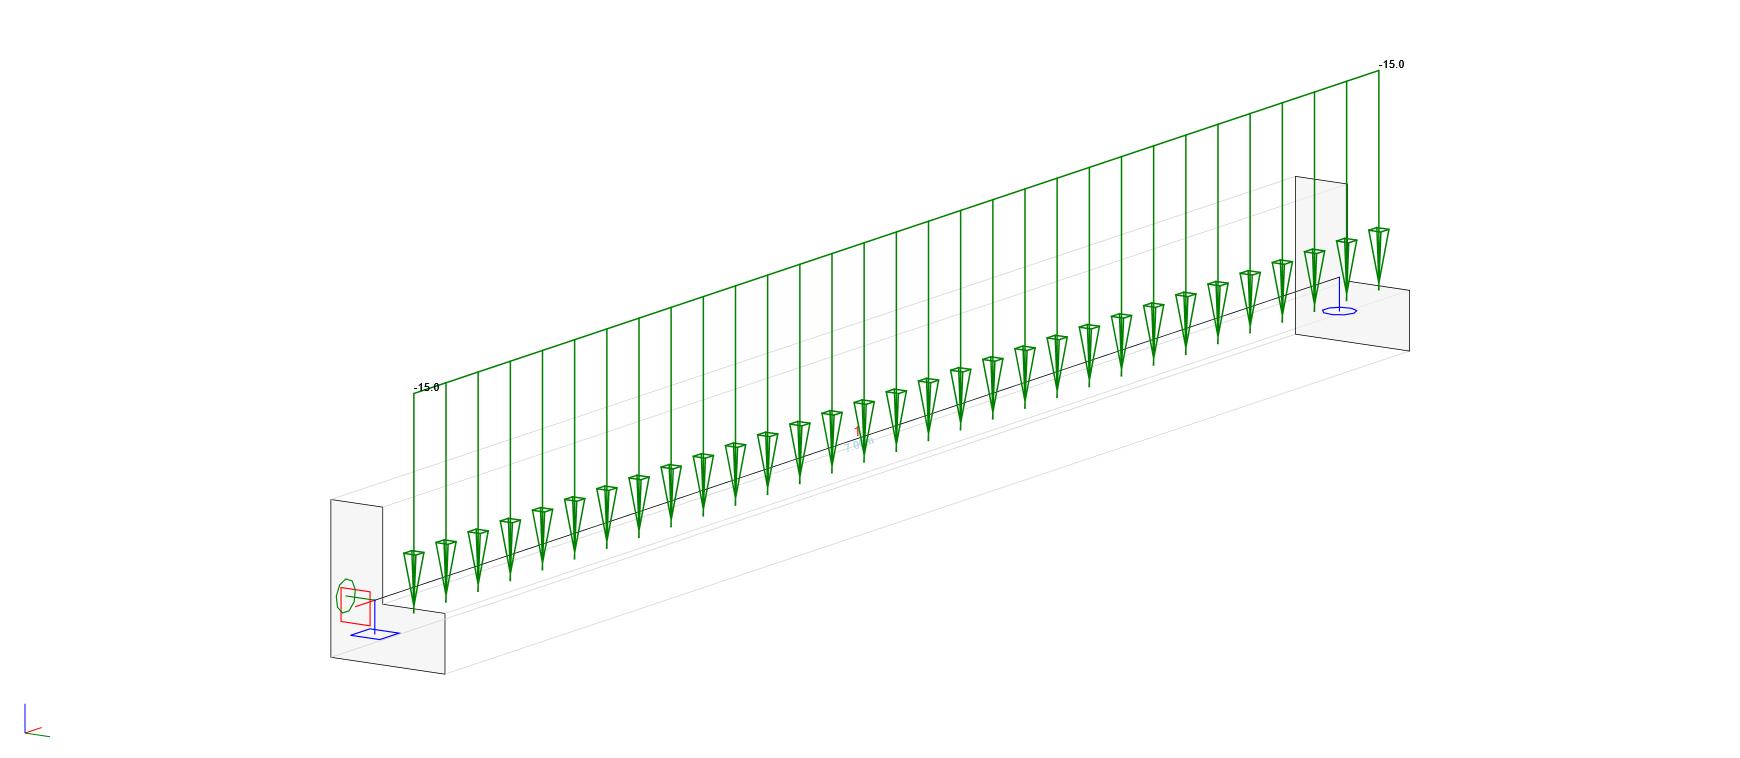 IDEA StatiCa UK - Ledge of a L-shaped beam subjected to line loads